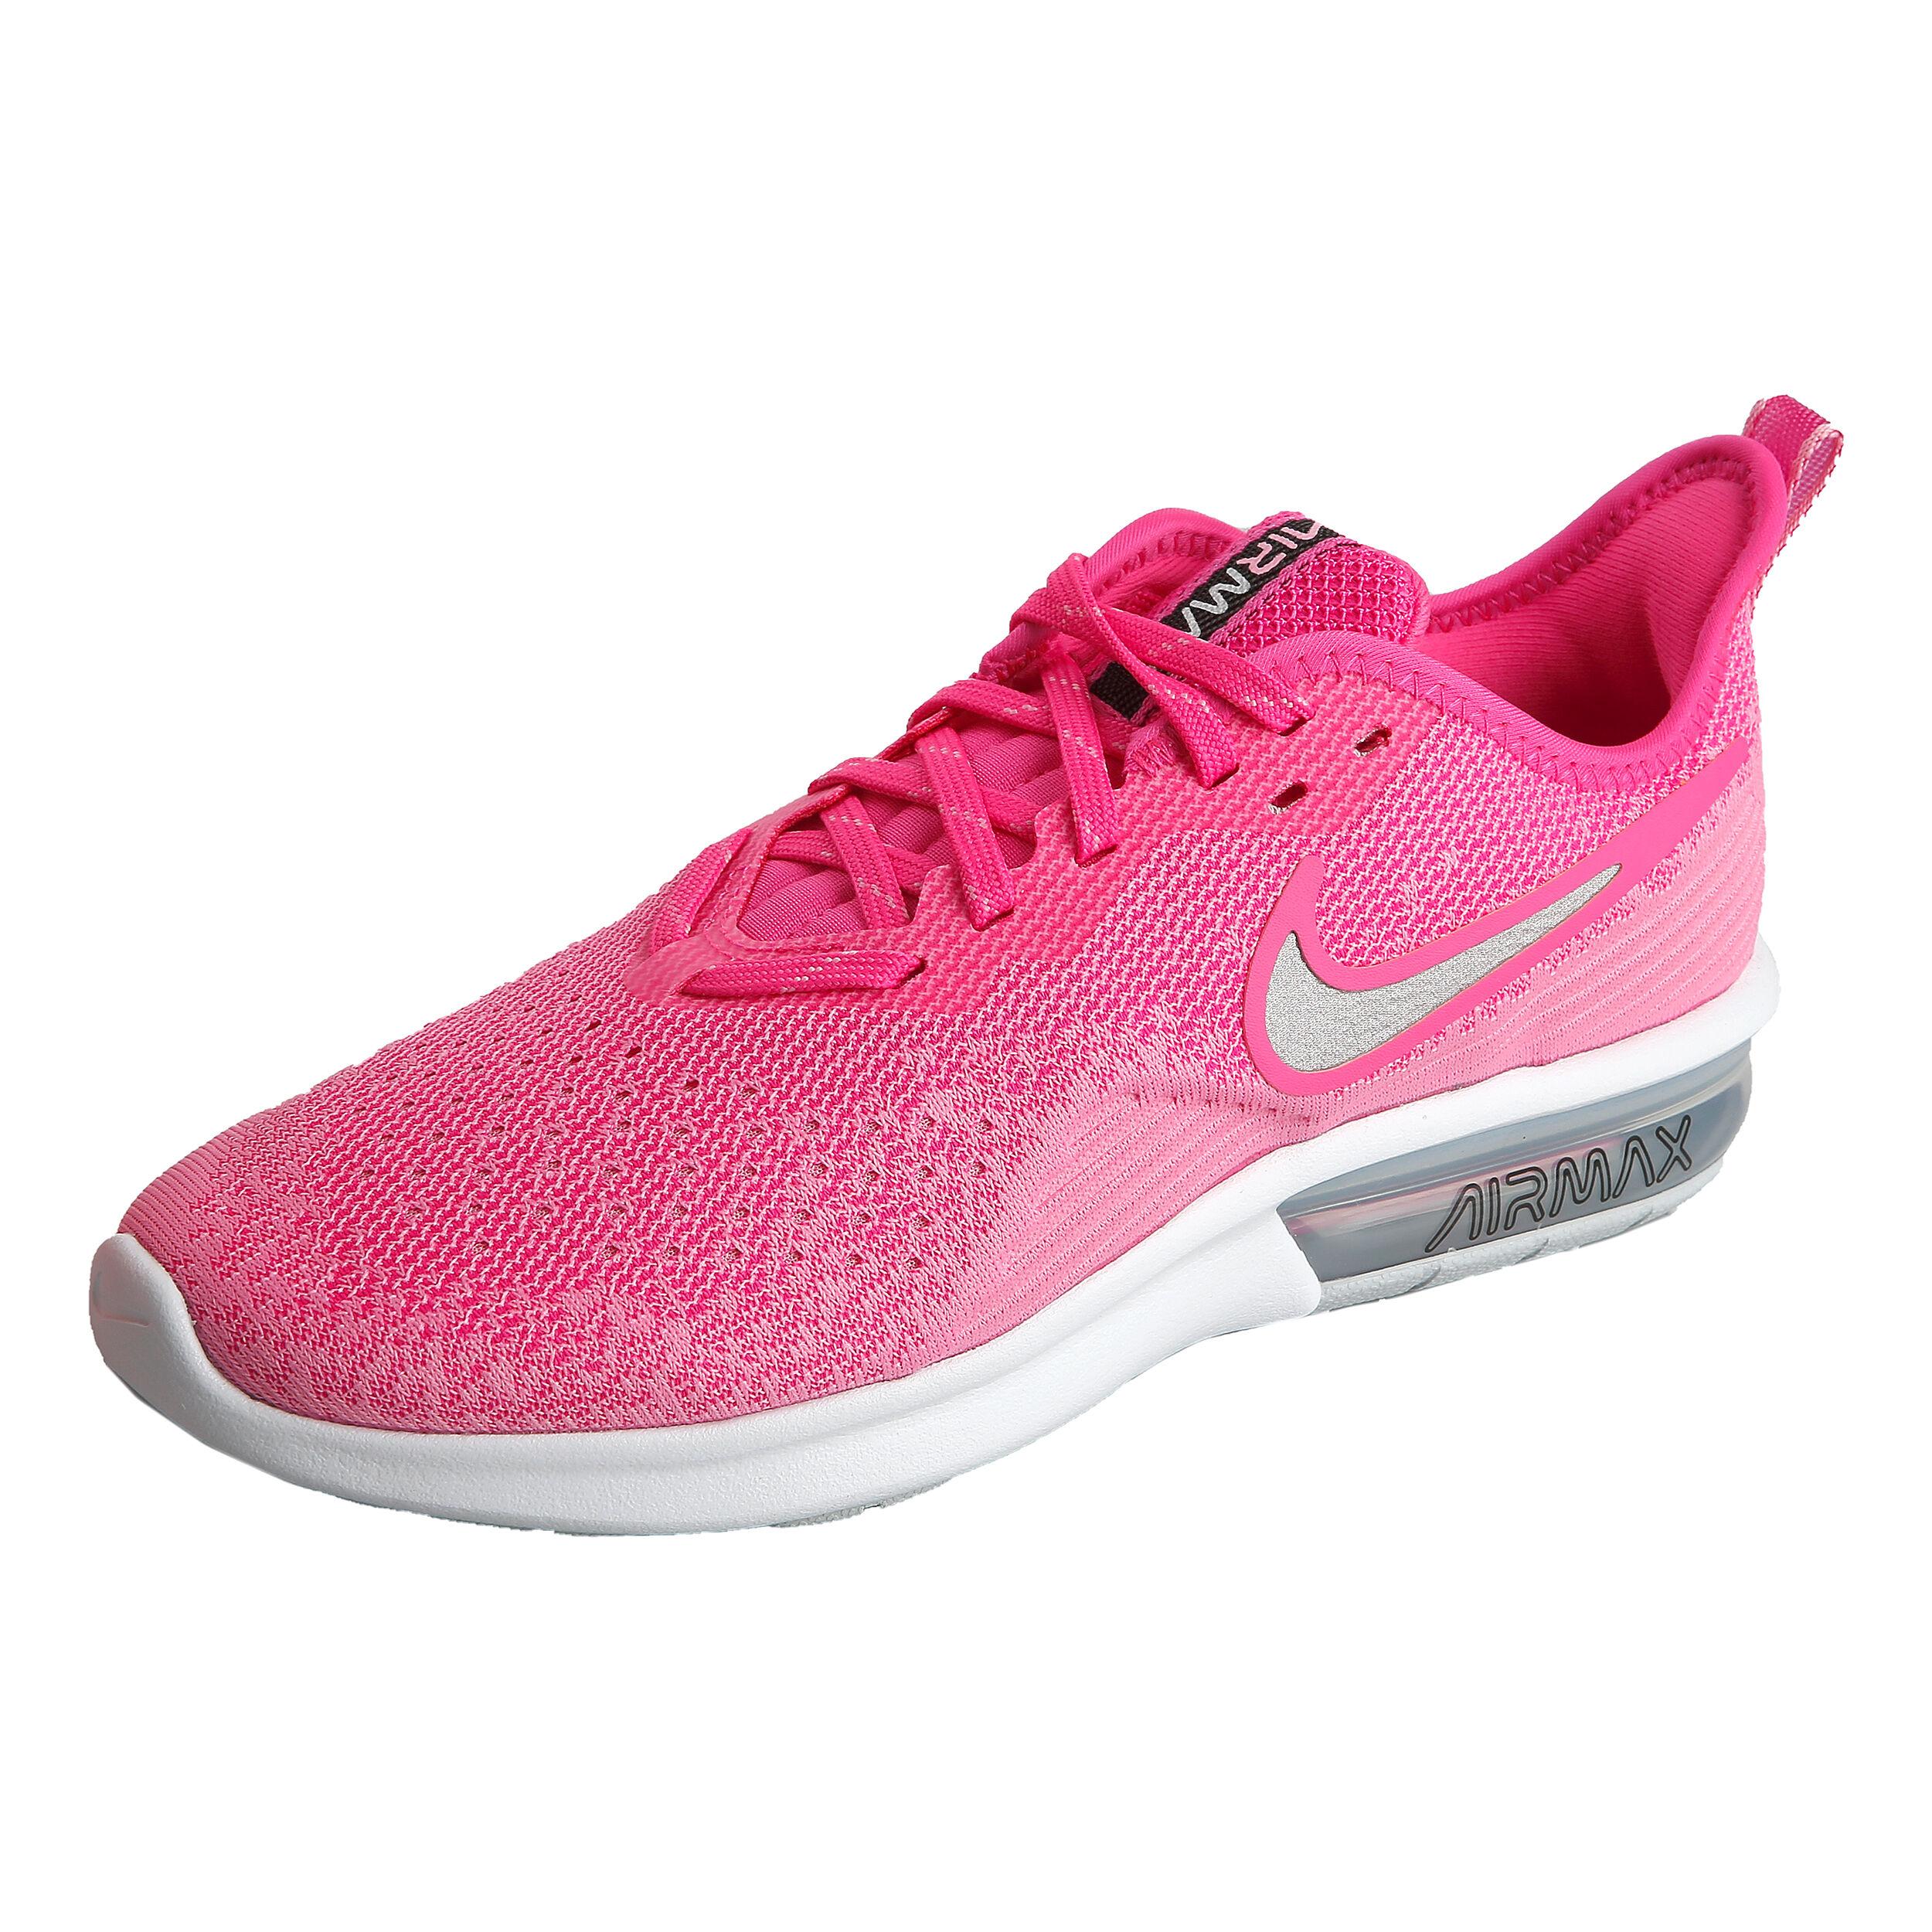 Nike Air Max Sequent 4 Neutralschuh Damen Pink, Weiß